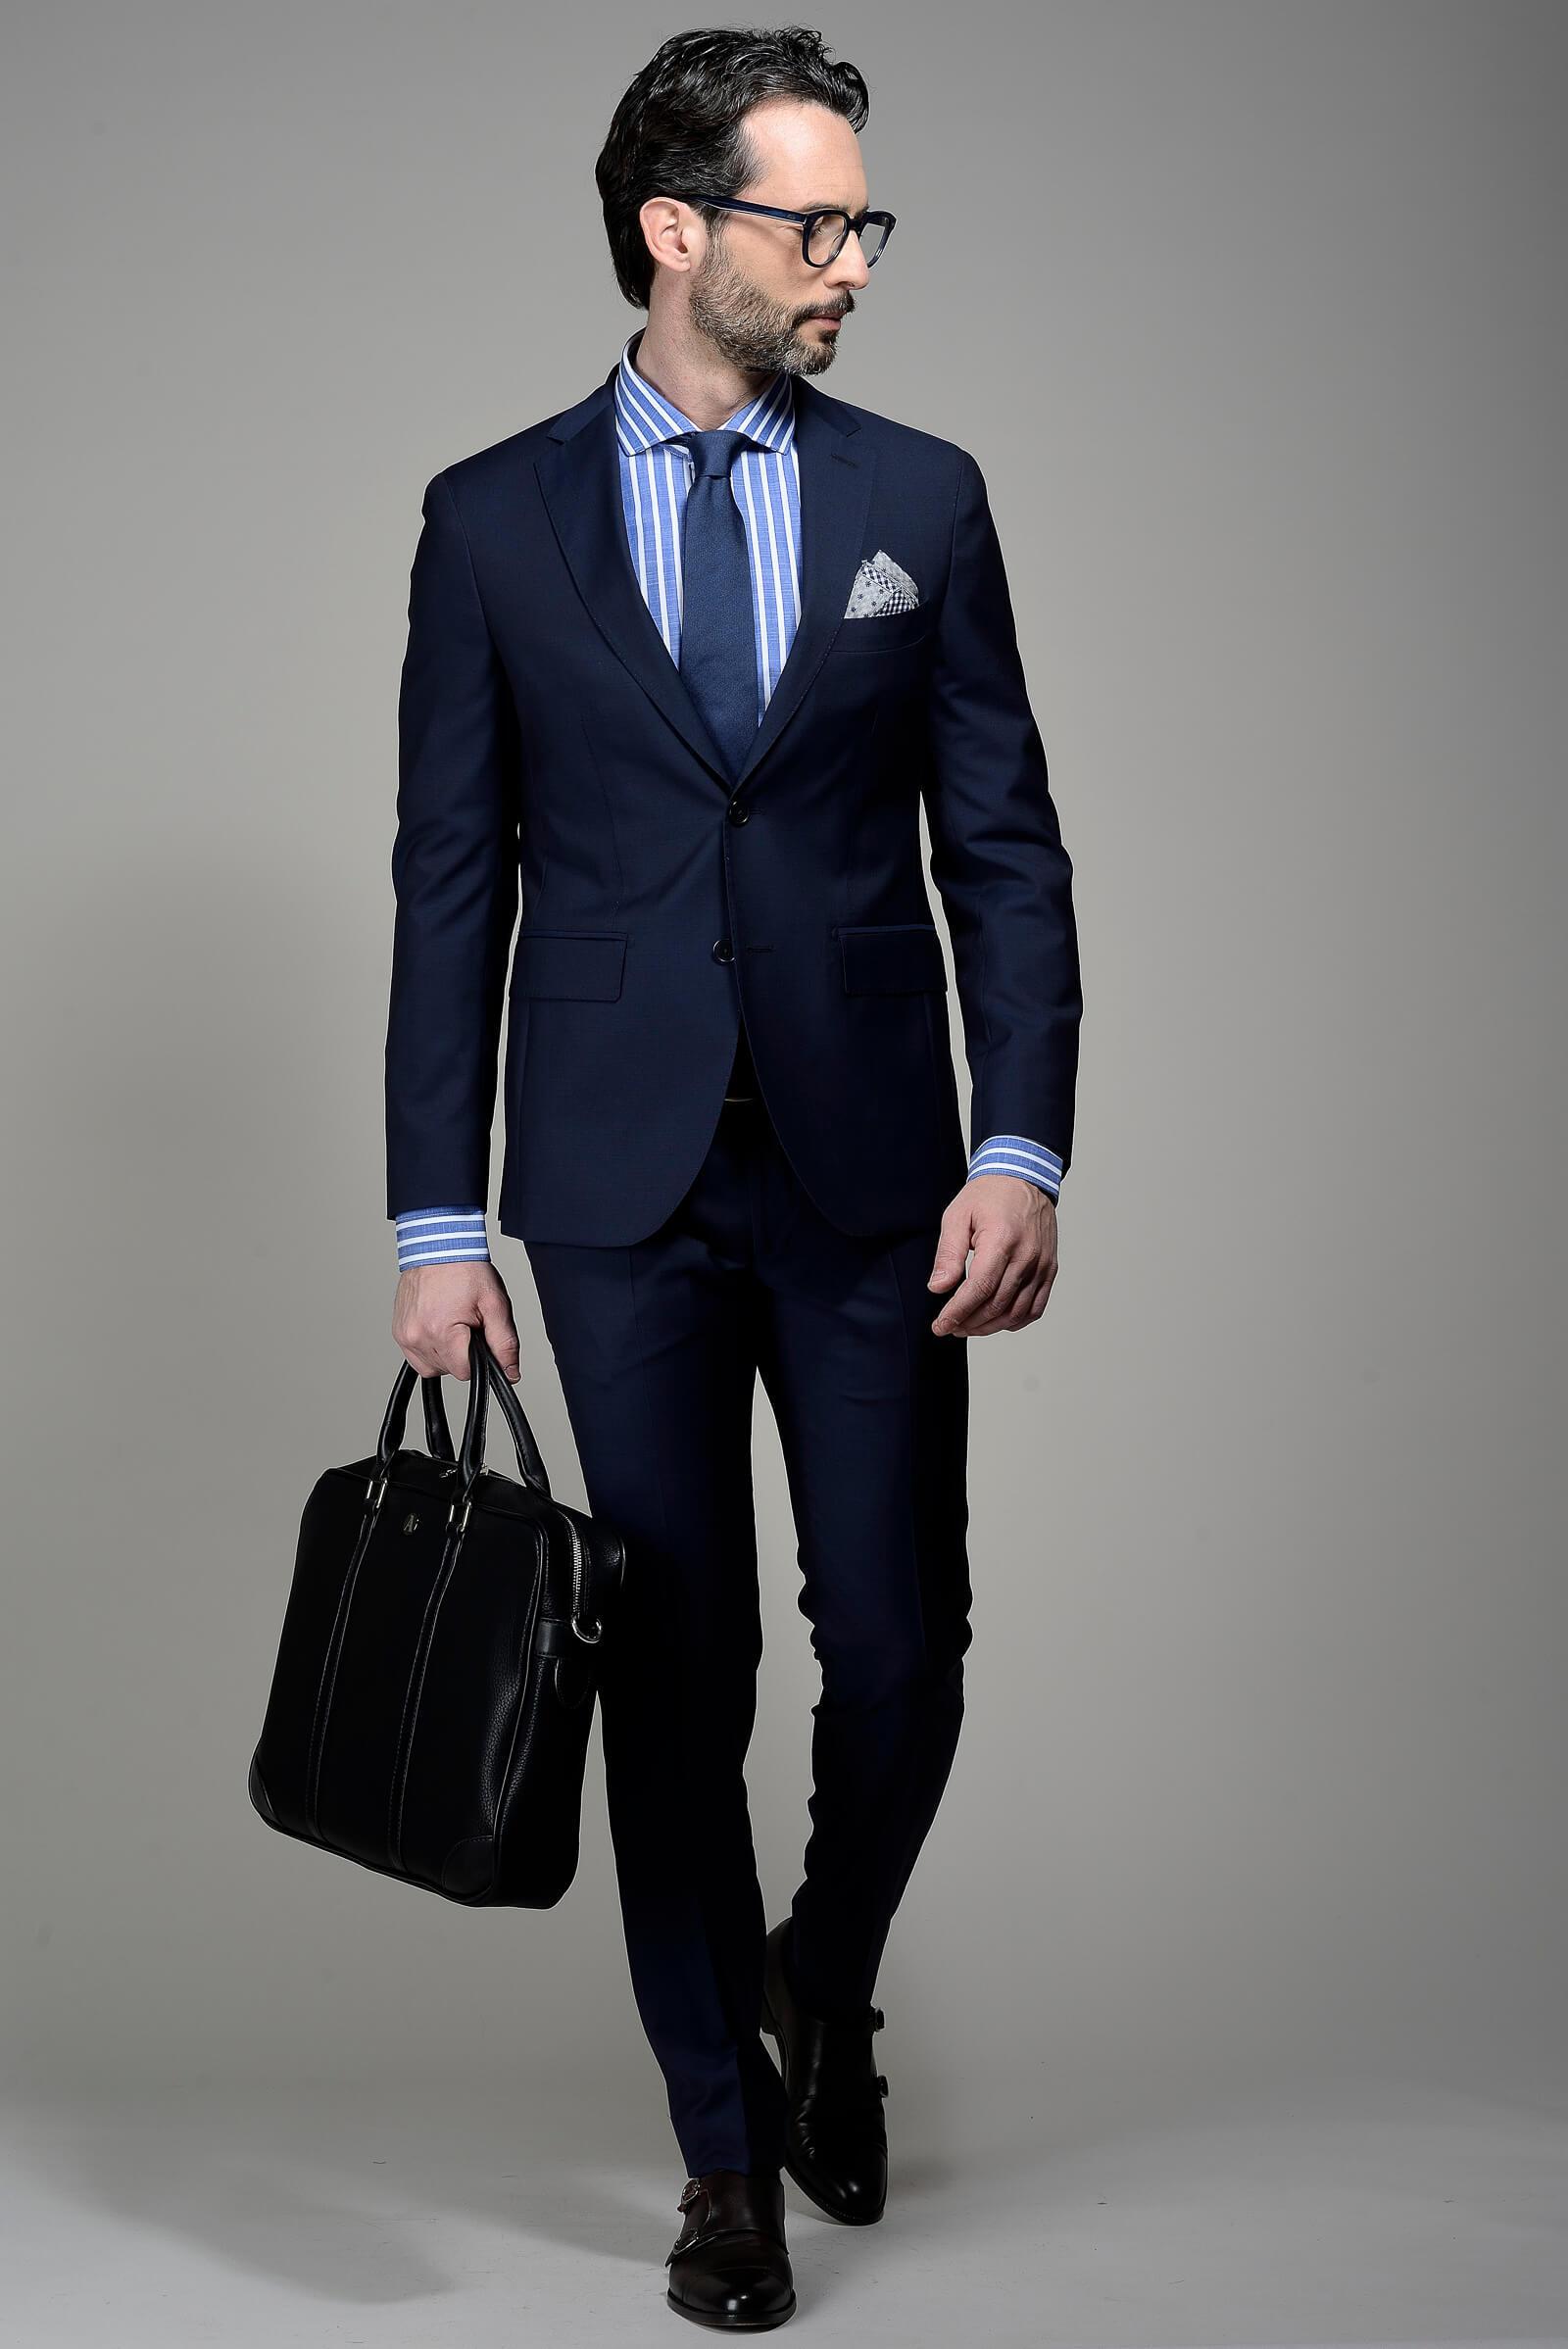 PERFECT BUSINESSMAN Angelico